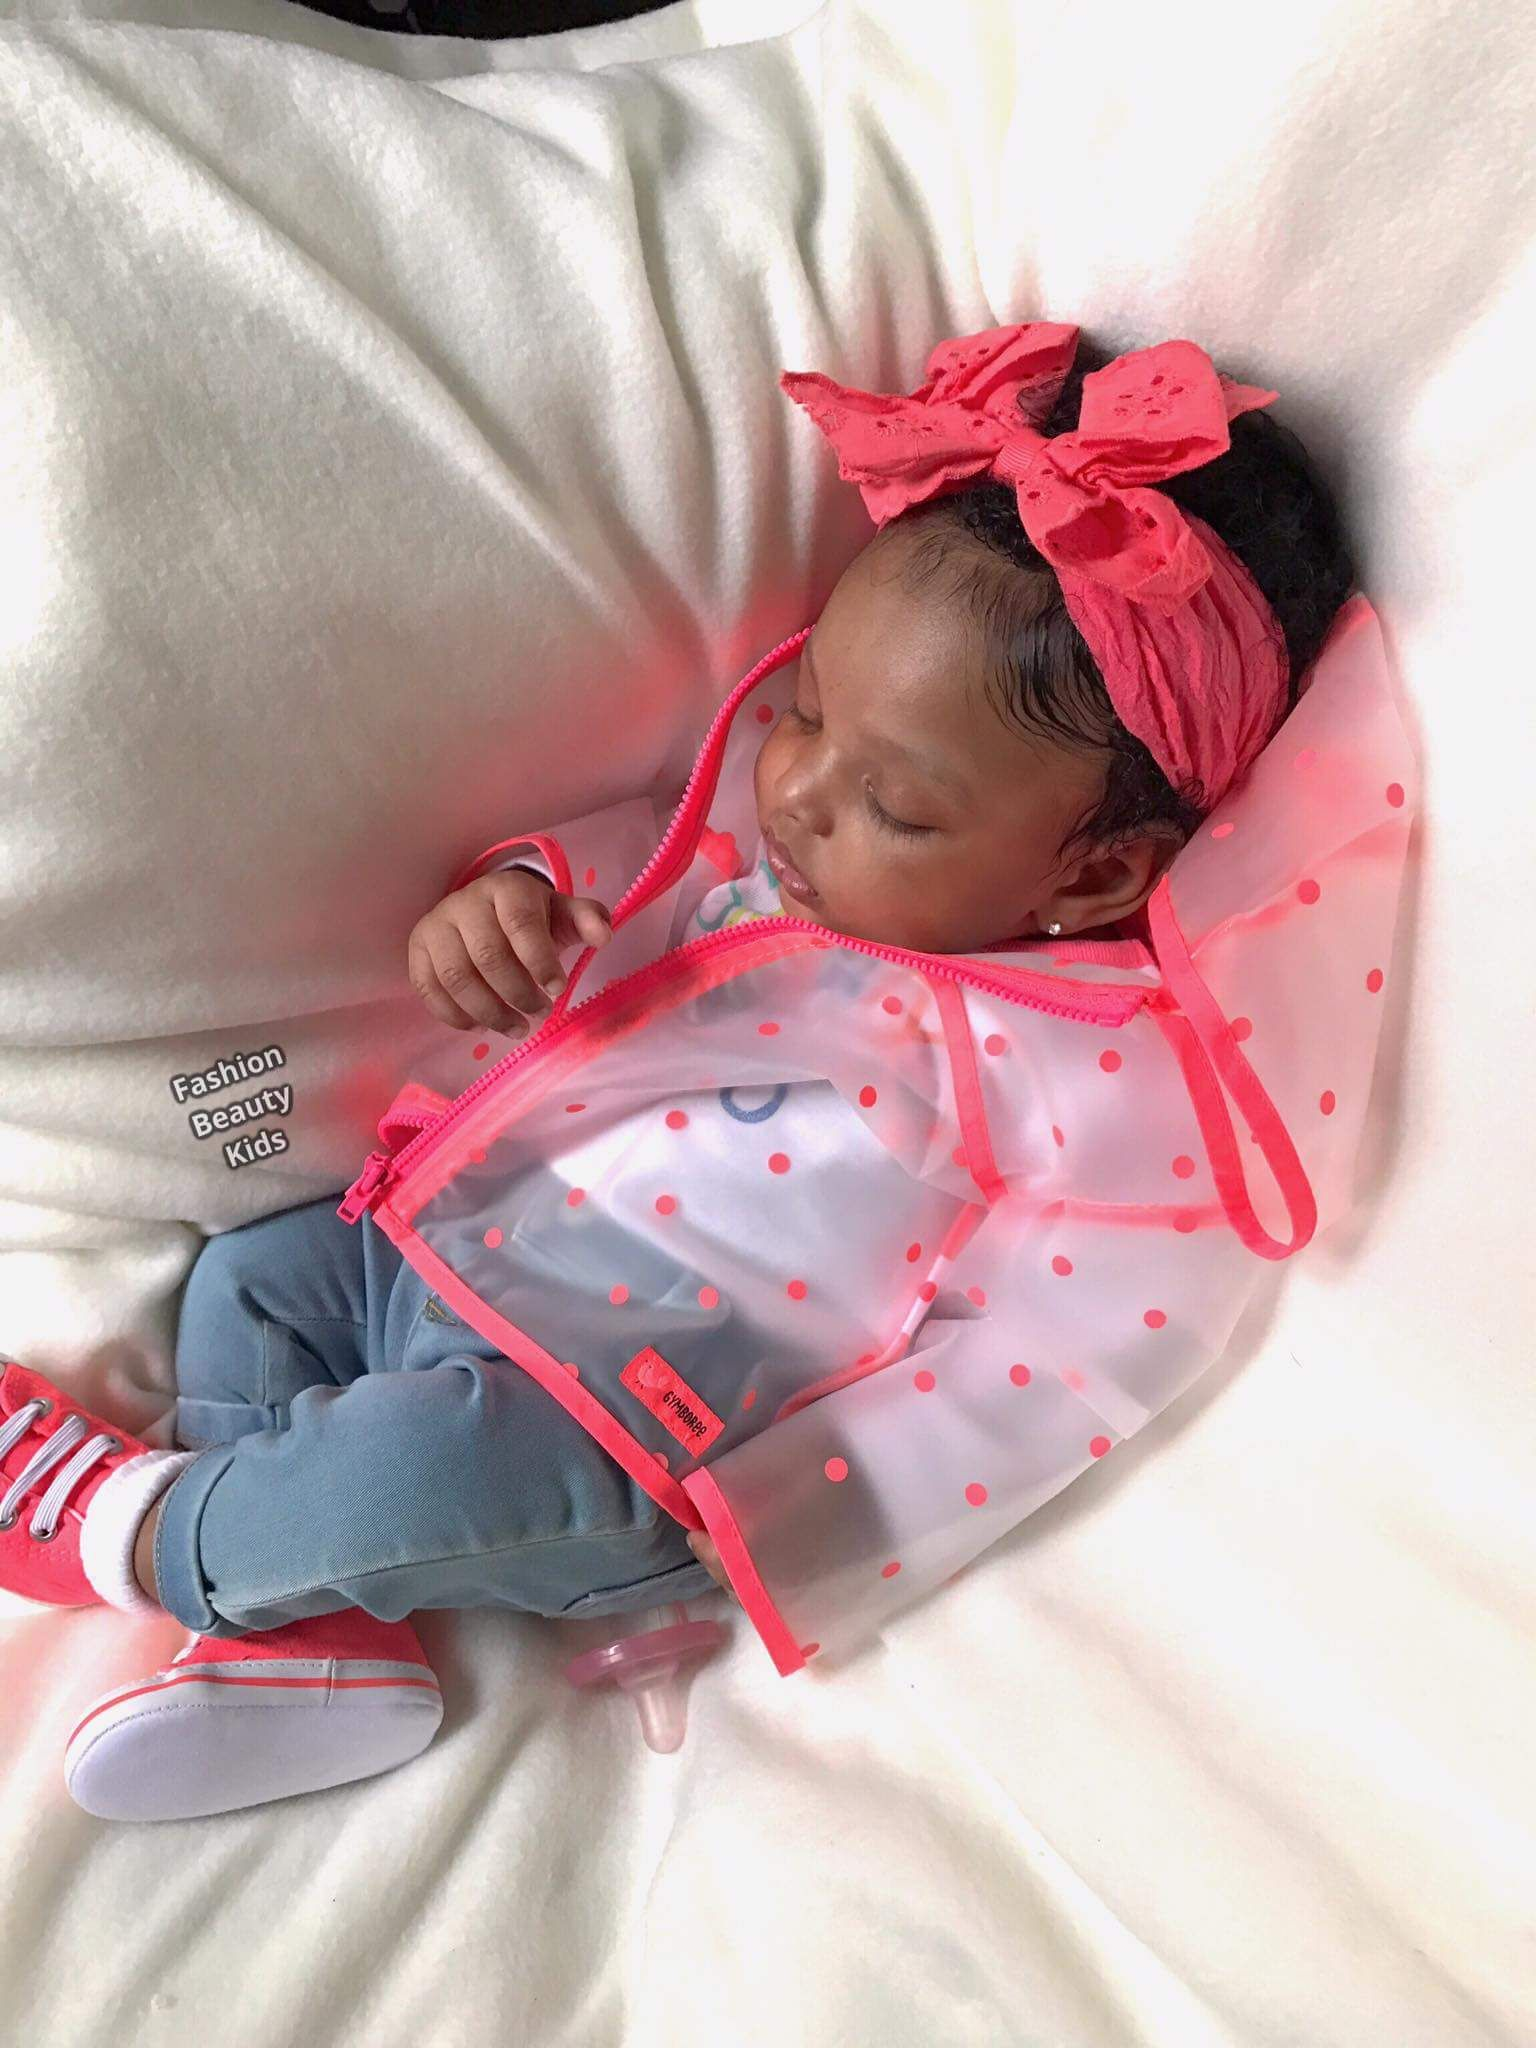 Baby Girl Raincoat Cute Baby Girl Cute Black Babies Pretty Baby